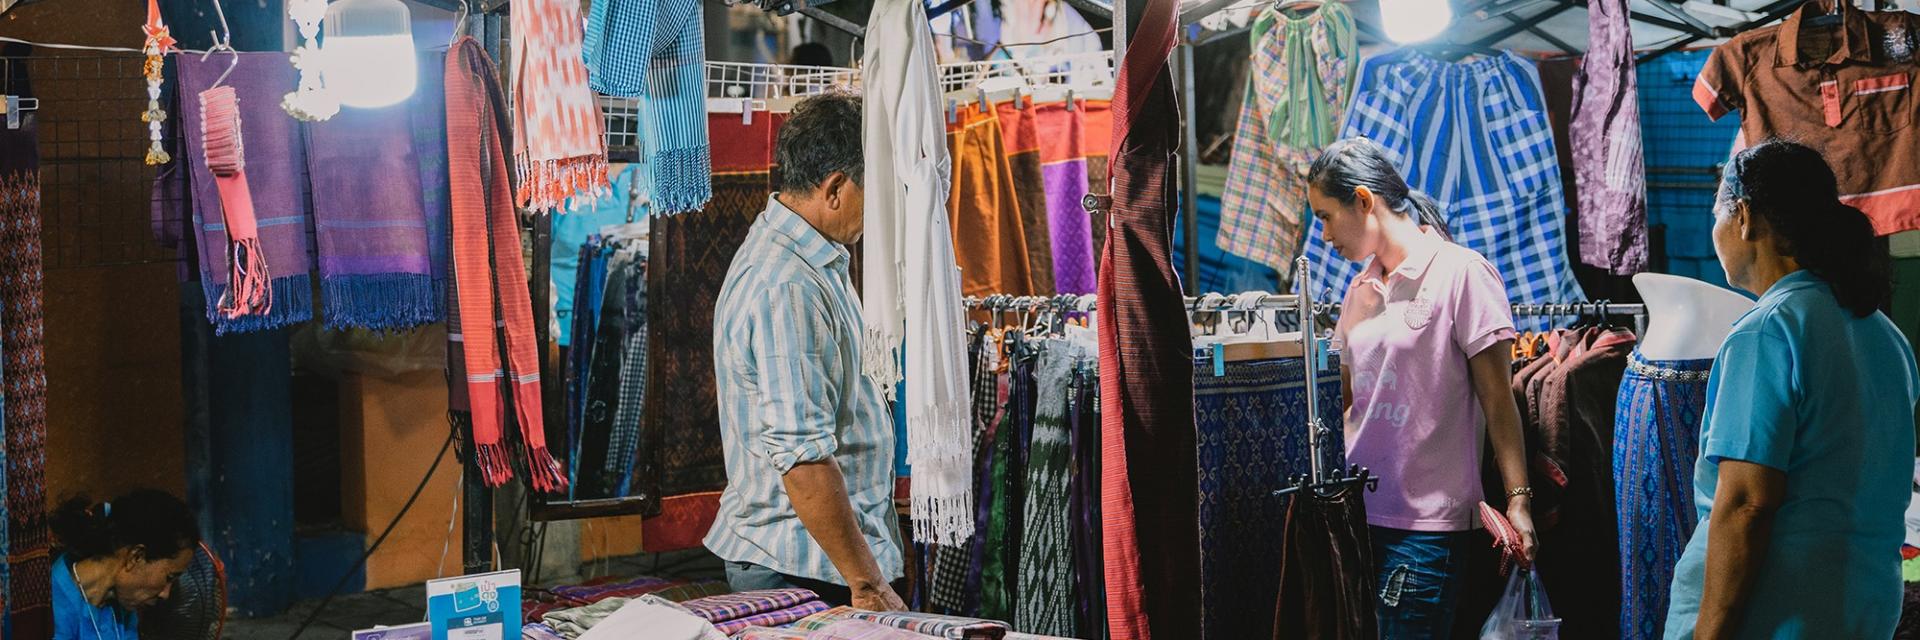 Enjoy Shopping in Southern Isan